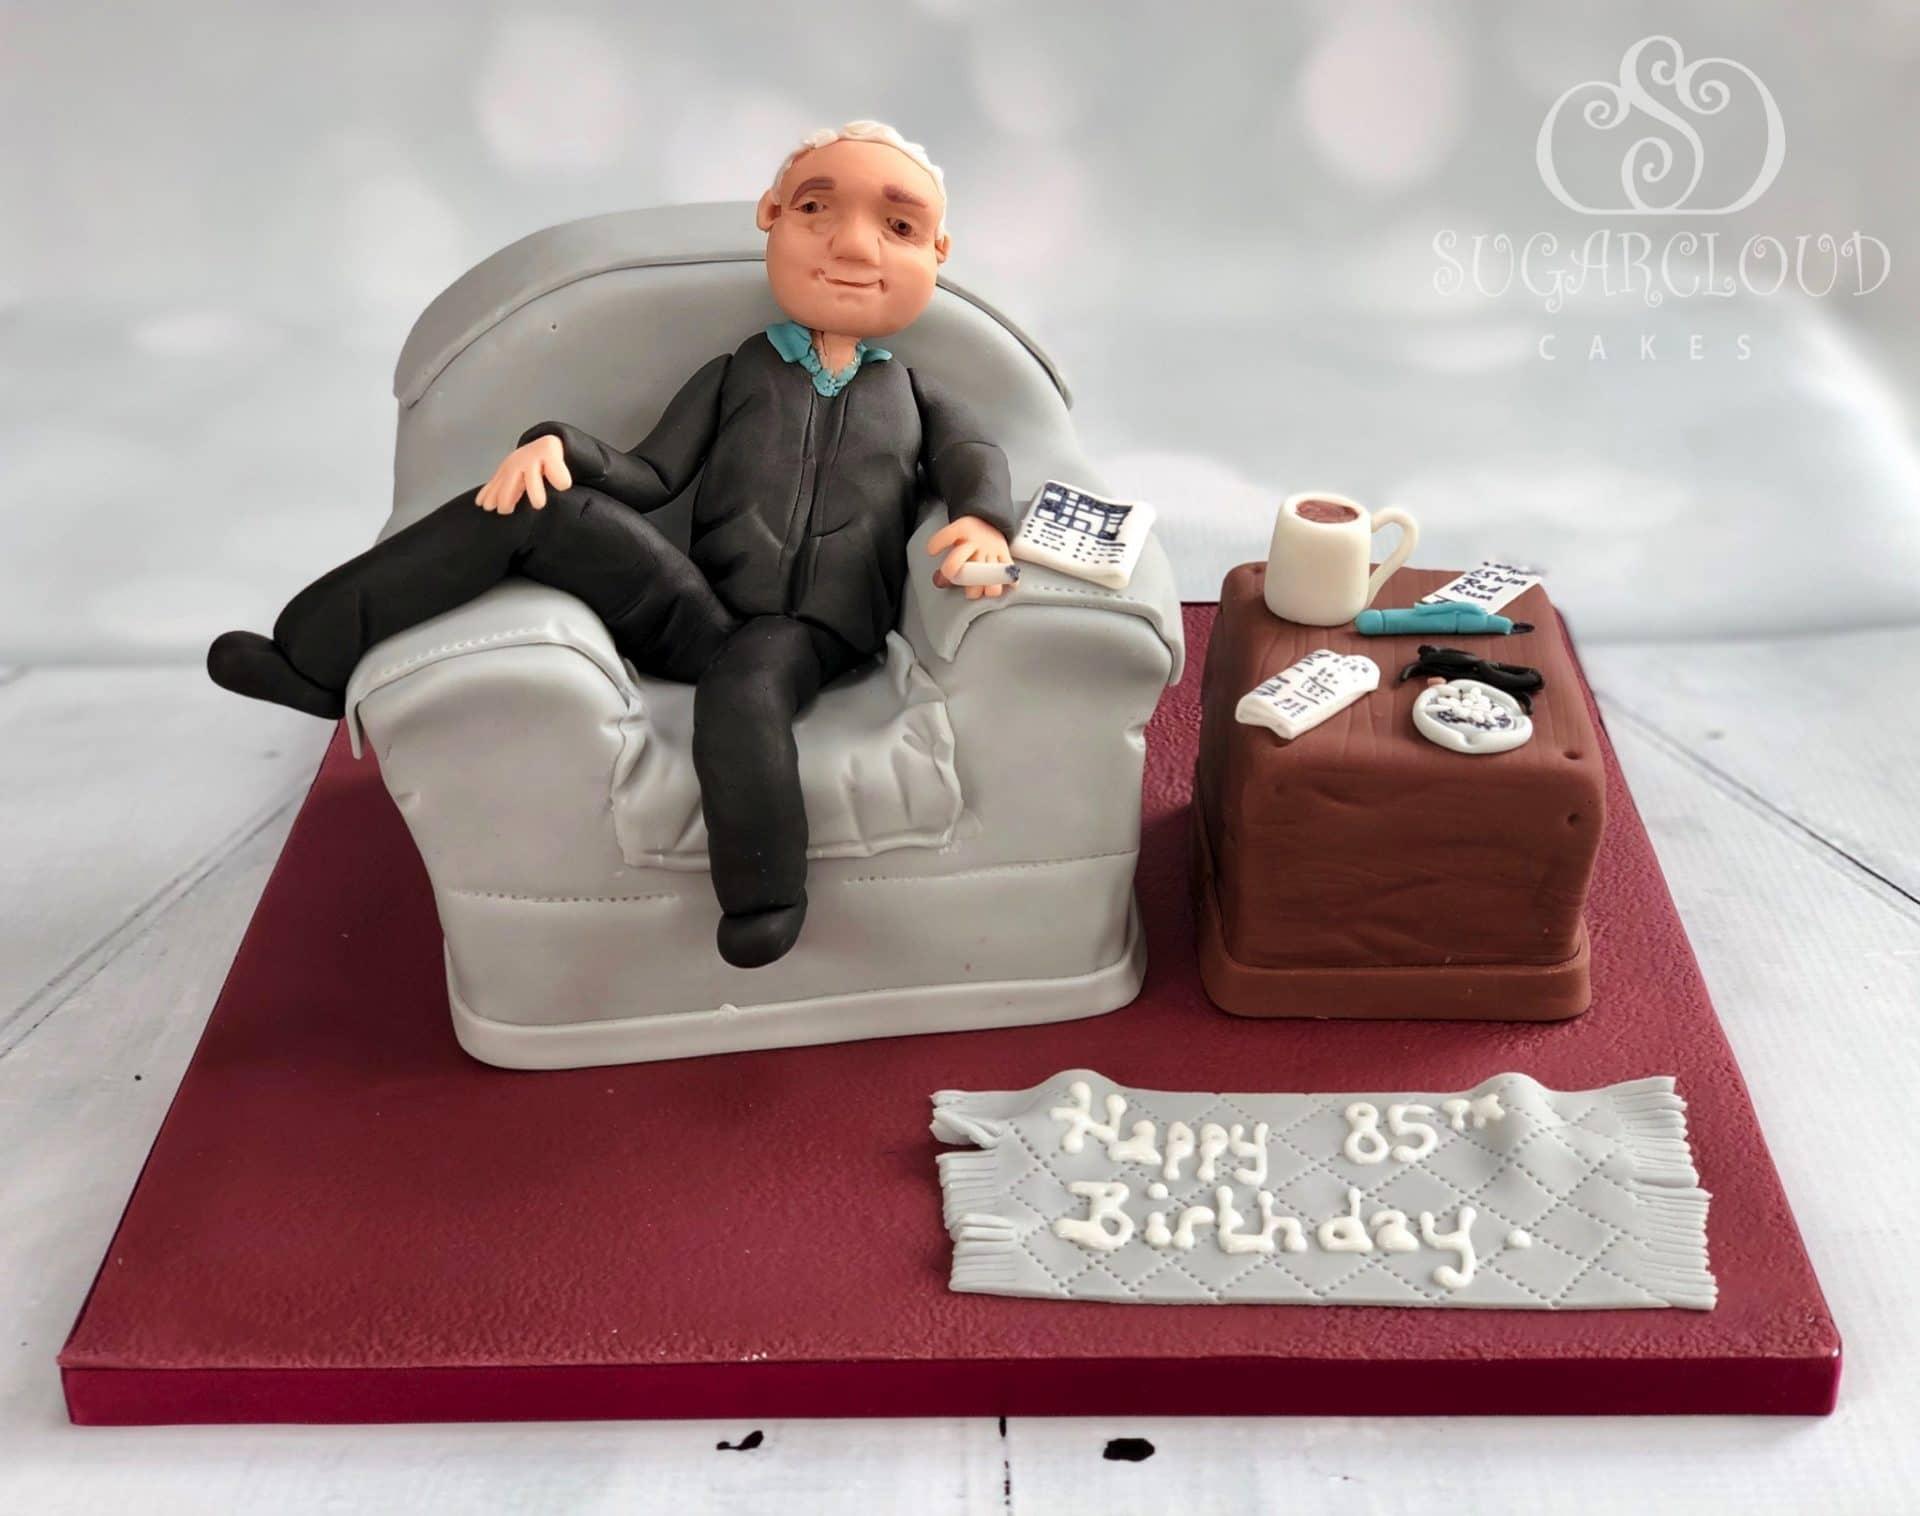 Armchair birthday cake